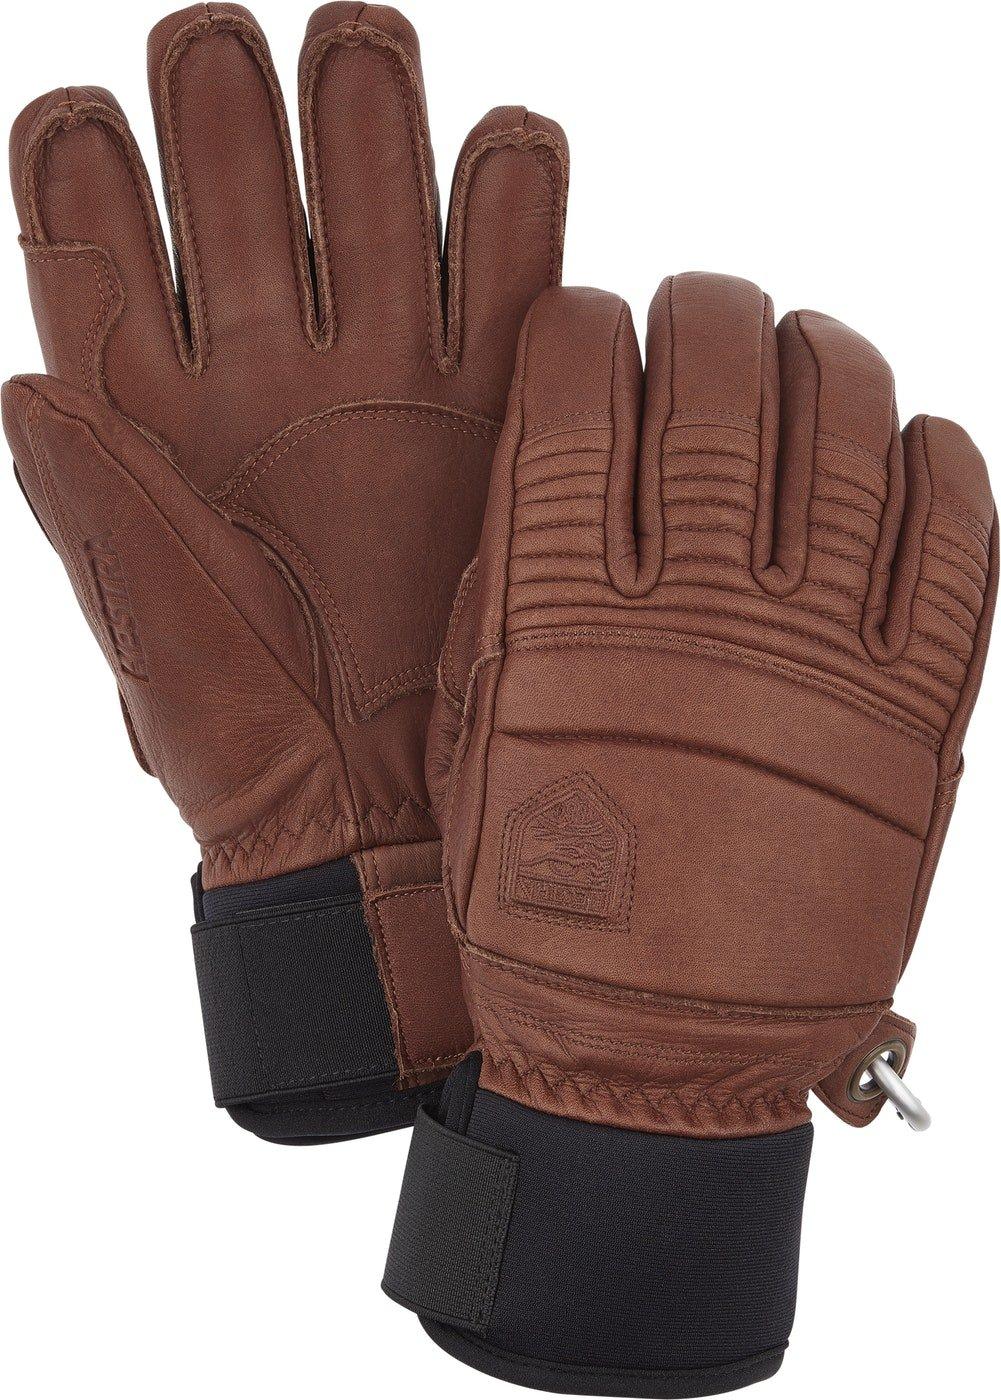 2019/20 Hestra M Fall Line Glove